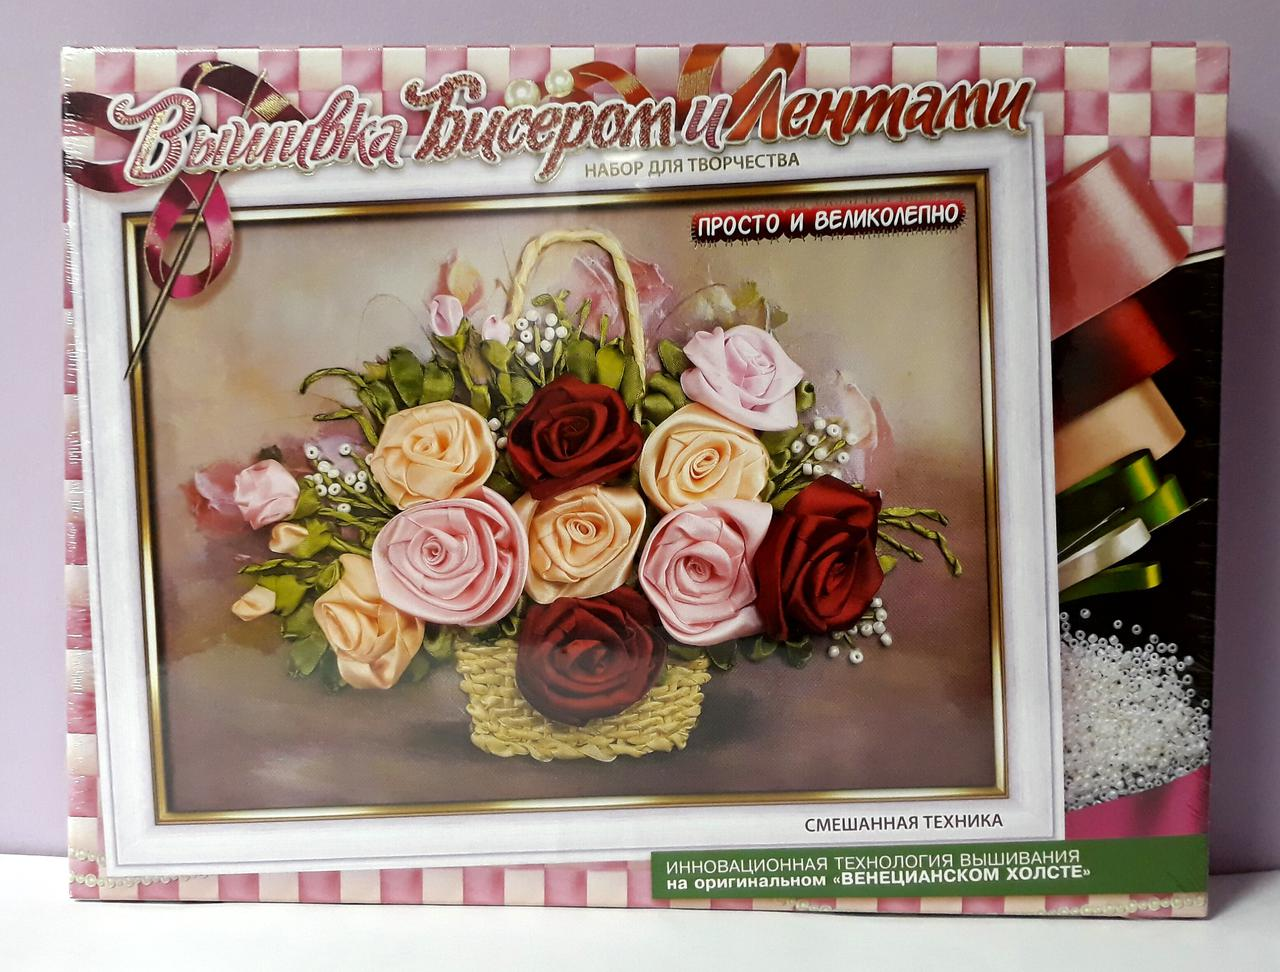 Вышивка Бисером и лентами: Розы БВ-01Р-08 Danko-Toys Украина